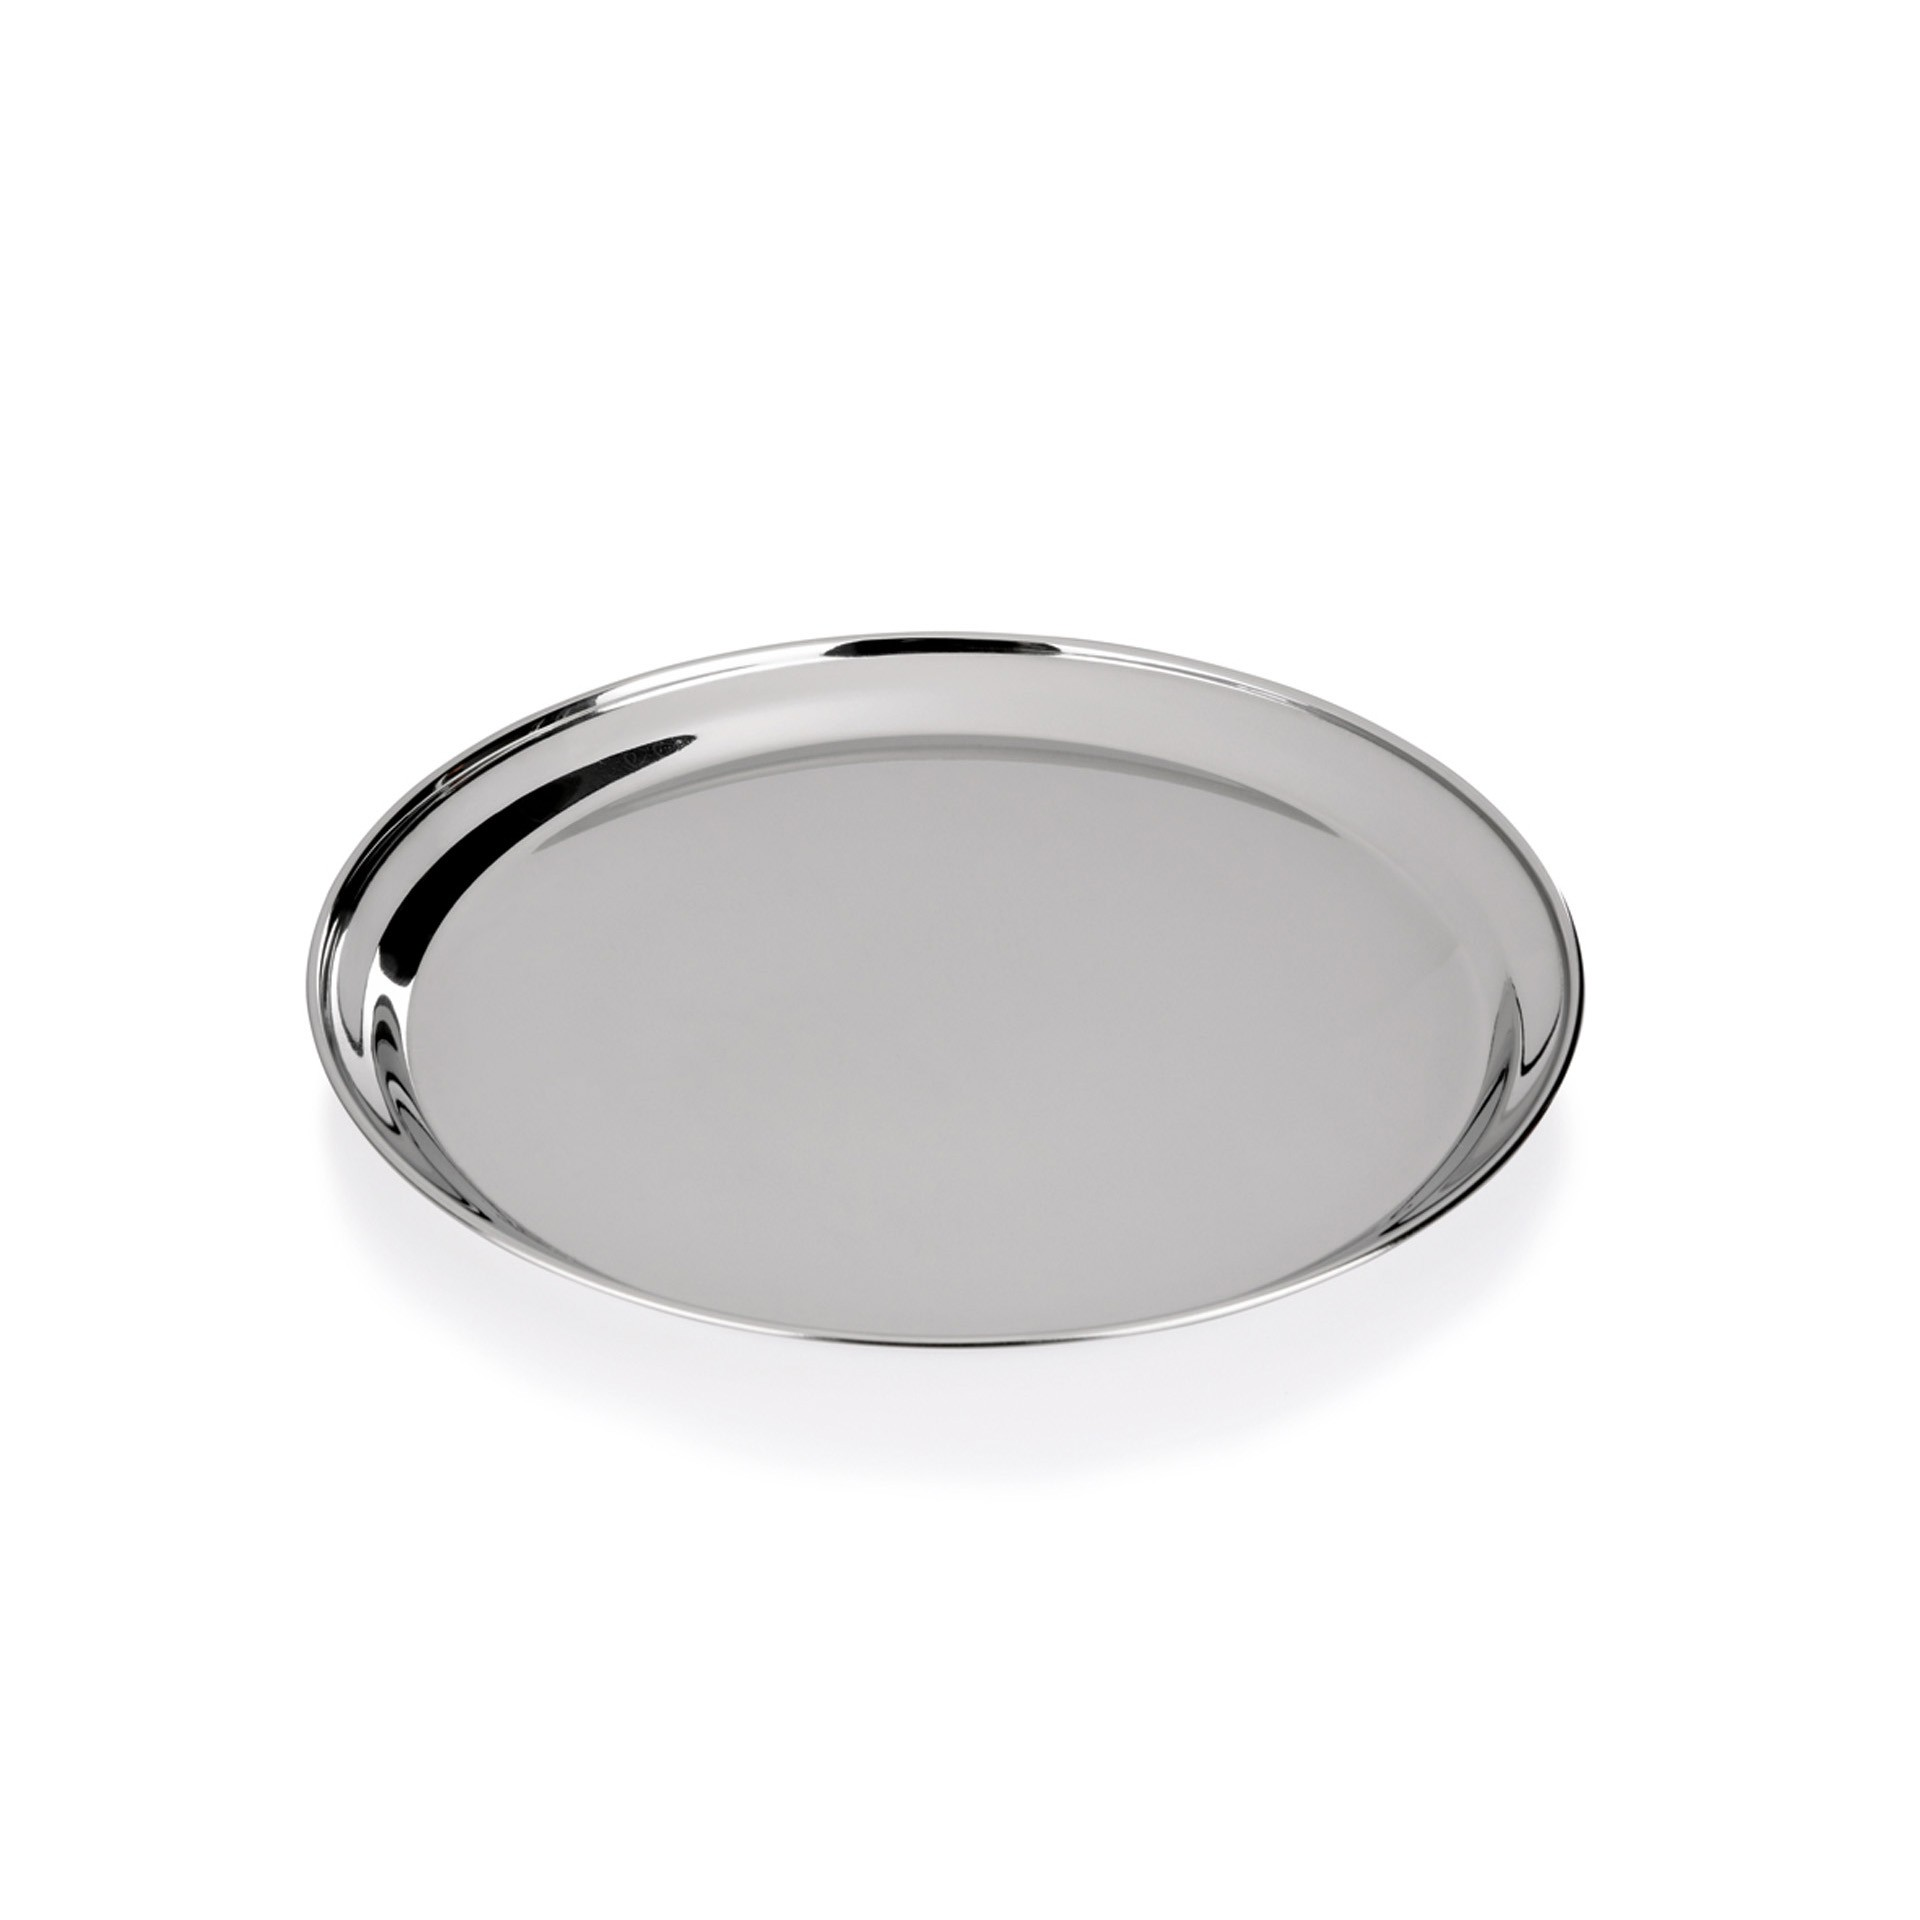 Kunststoff rutschhemmend Tablett Serviertablett rund Ø 32 cm- 40 cm wählbar